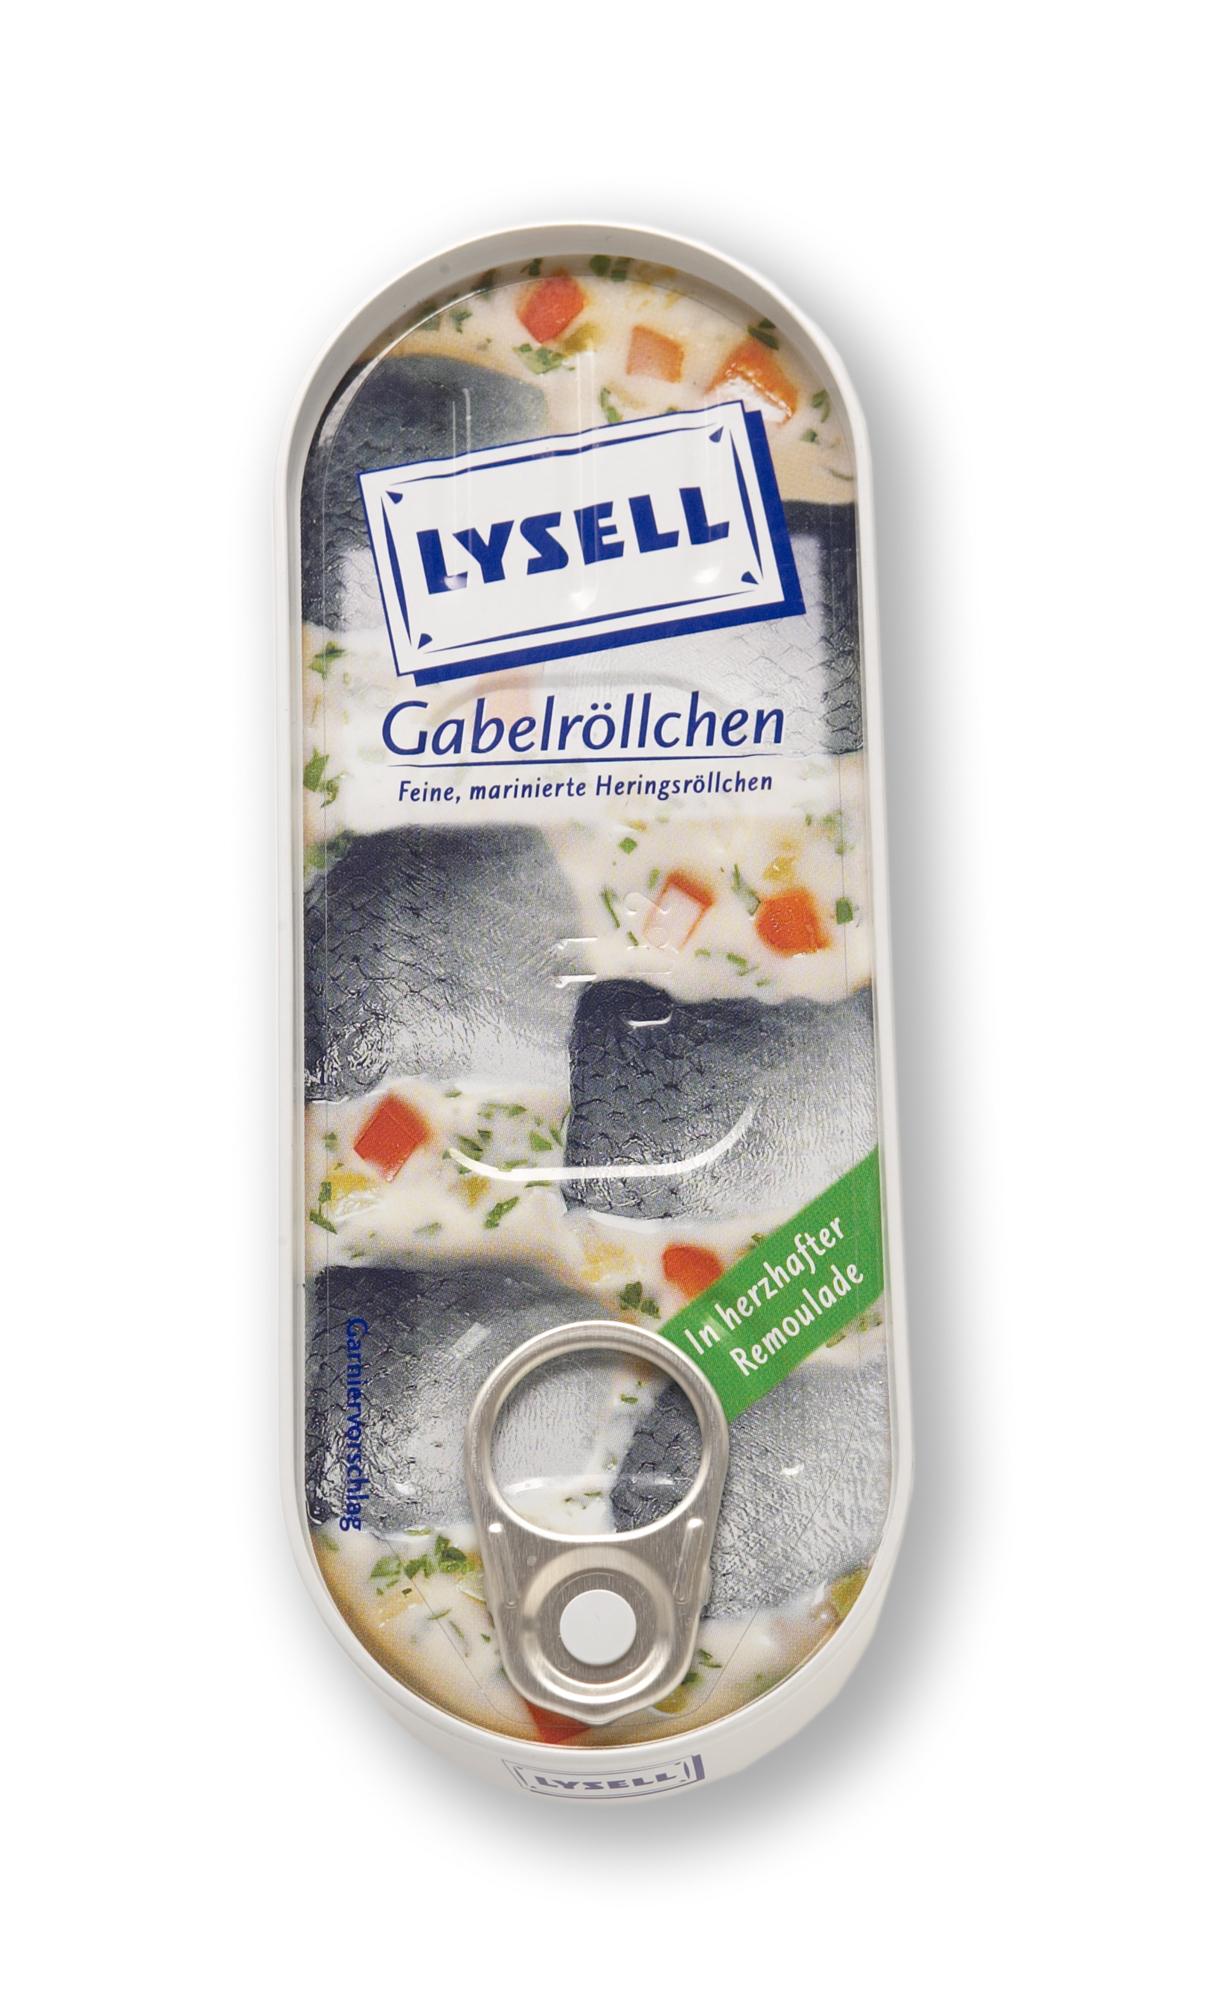 Lysell